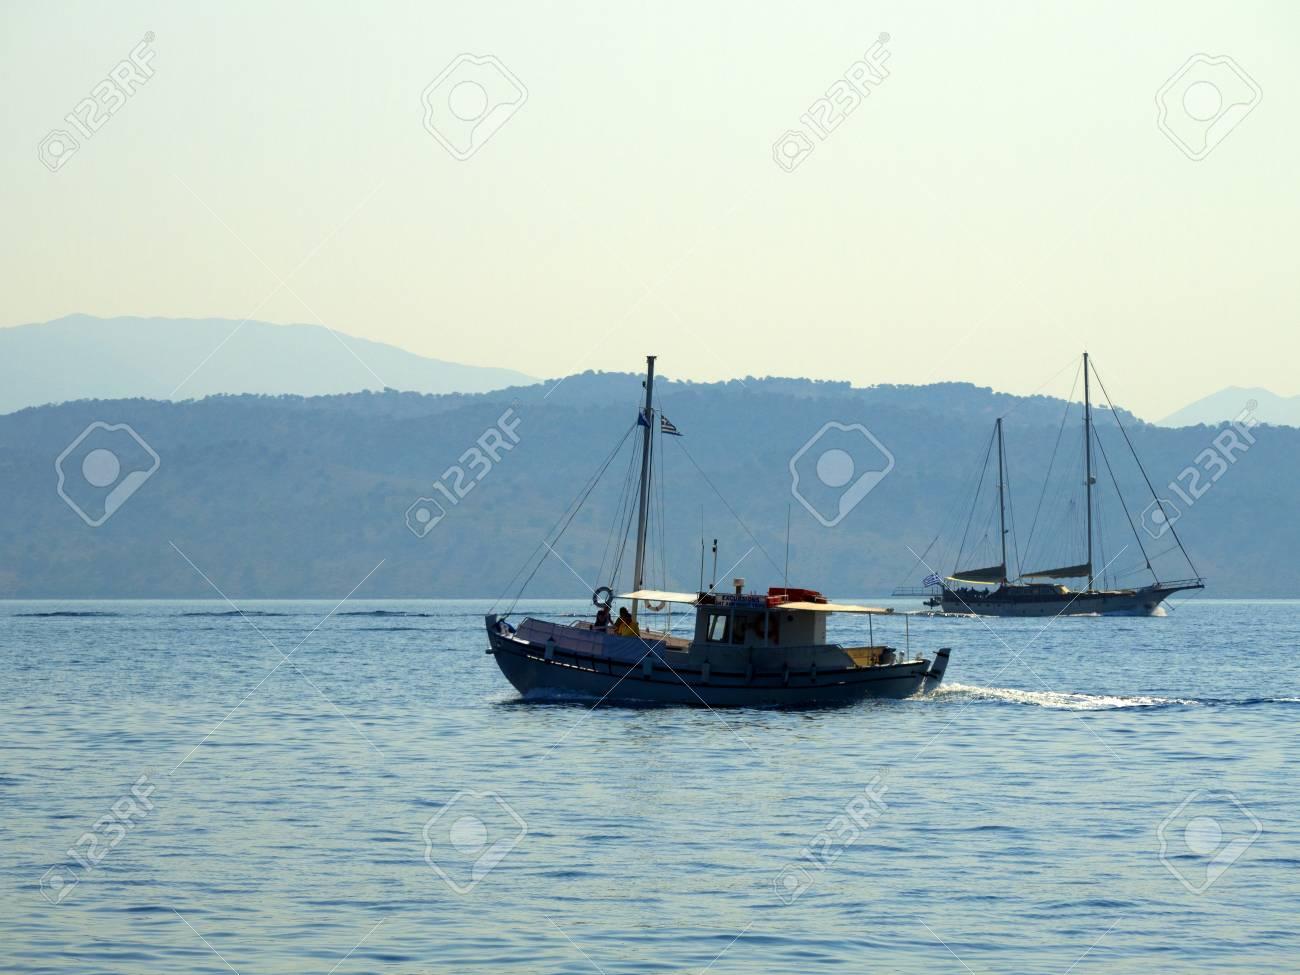 Boat trip to beautiful secluded beach on Island of Corfu Greece Stock Photo - 11349002